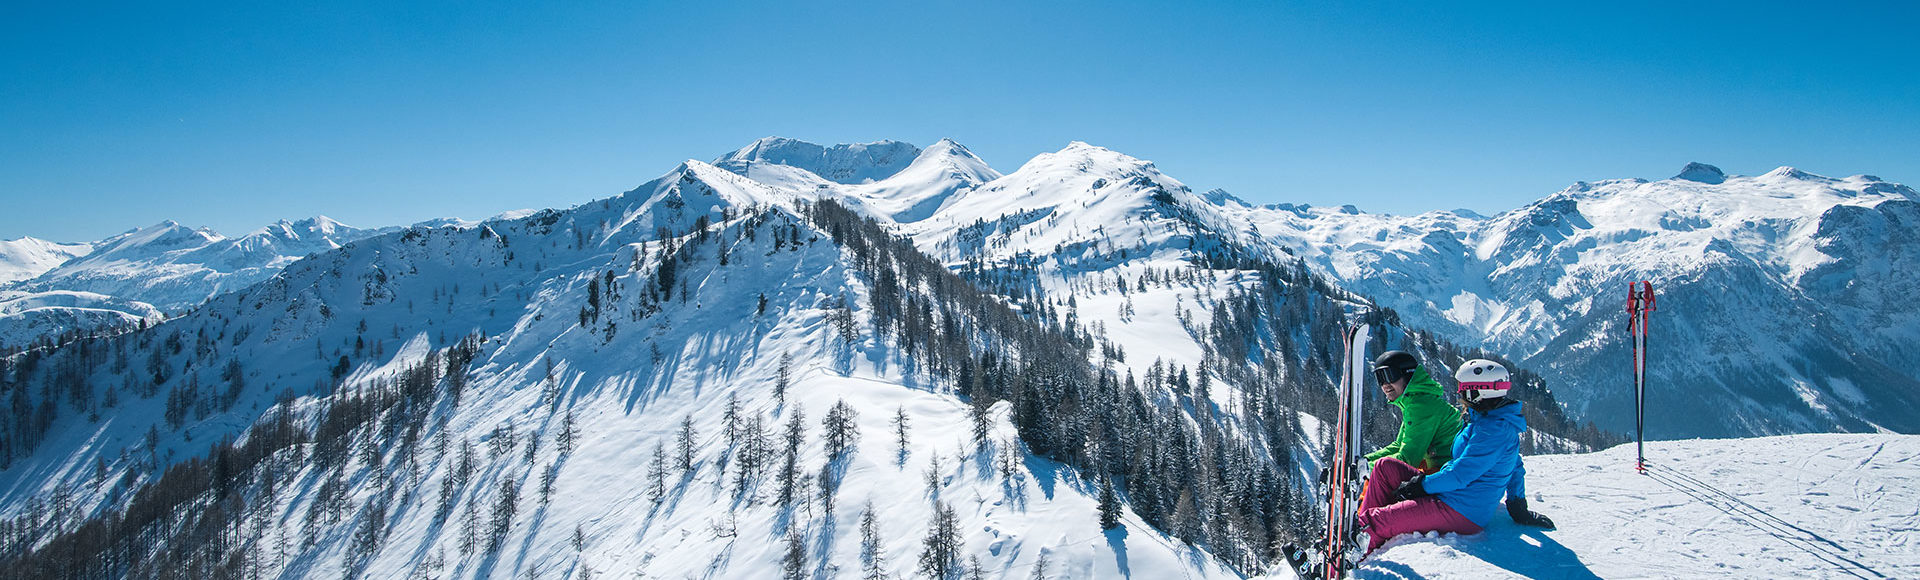 Winterurlaub & Skiurlaub in Zauchensee